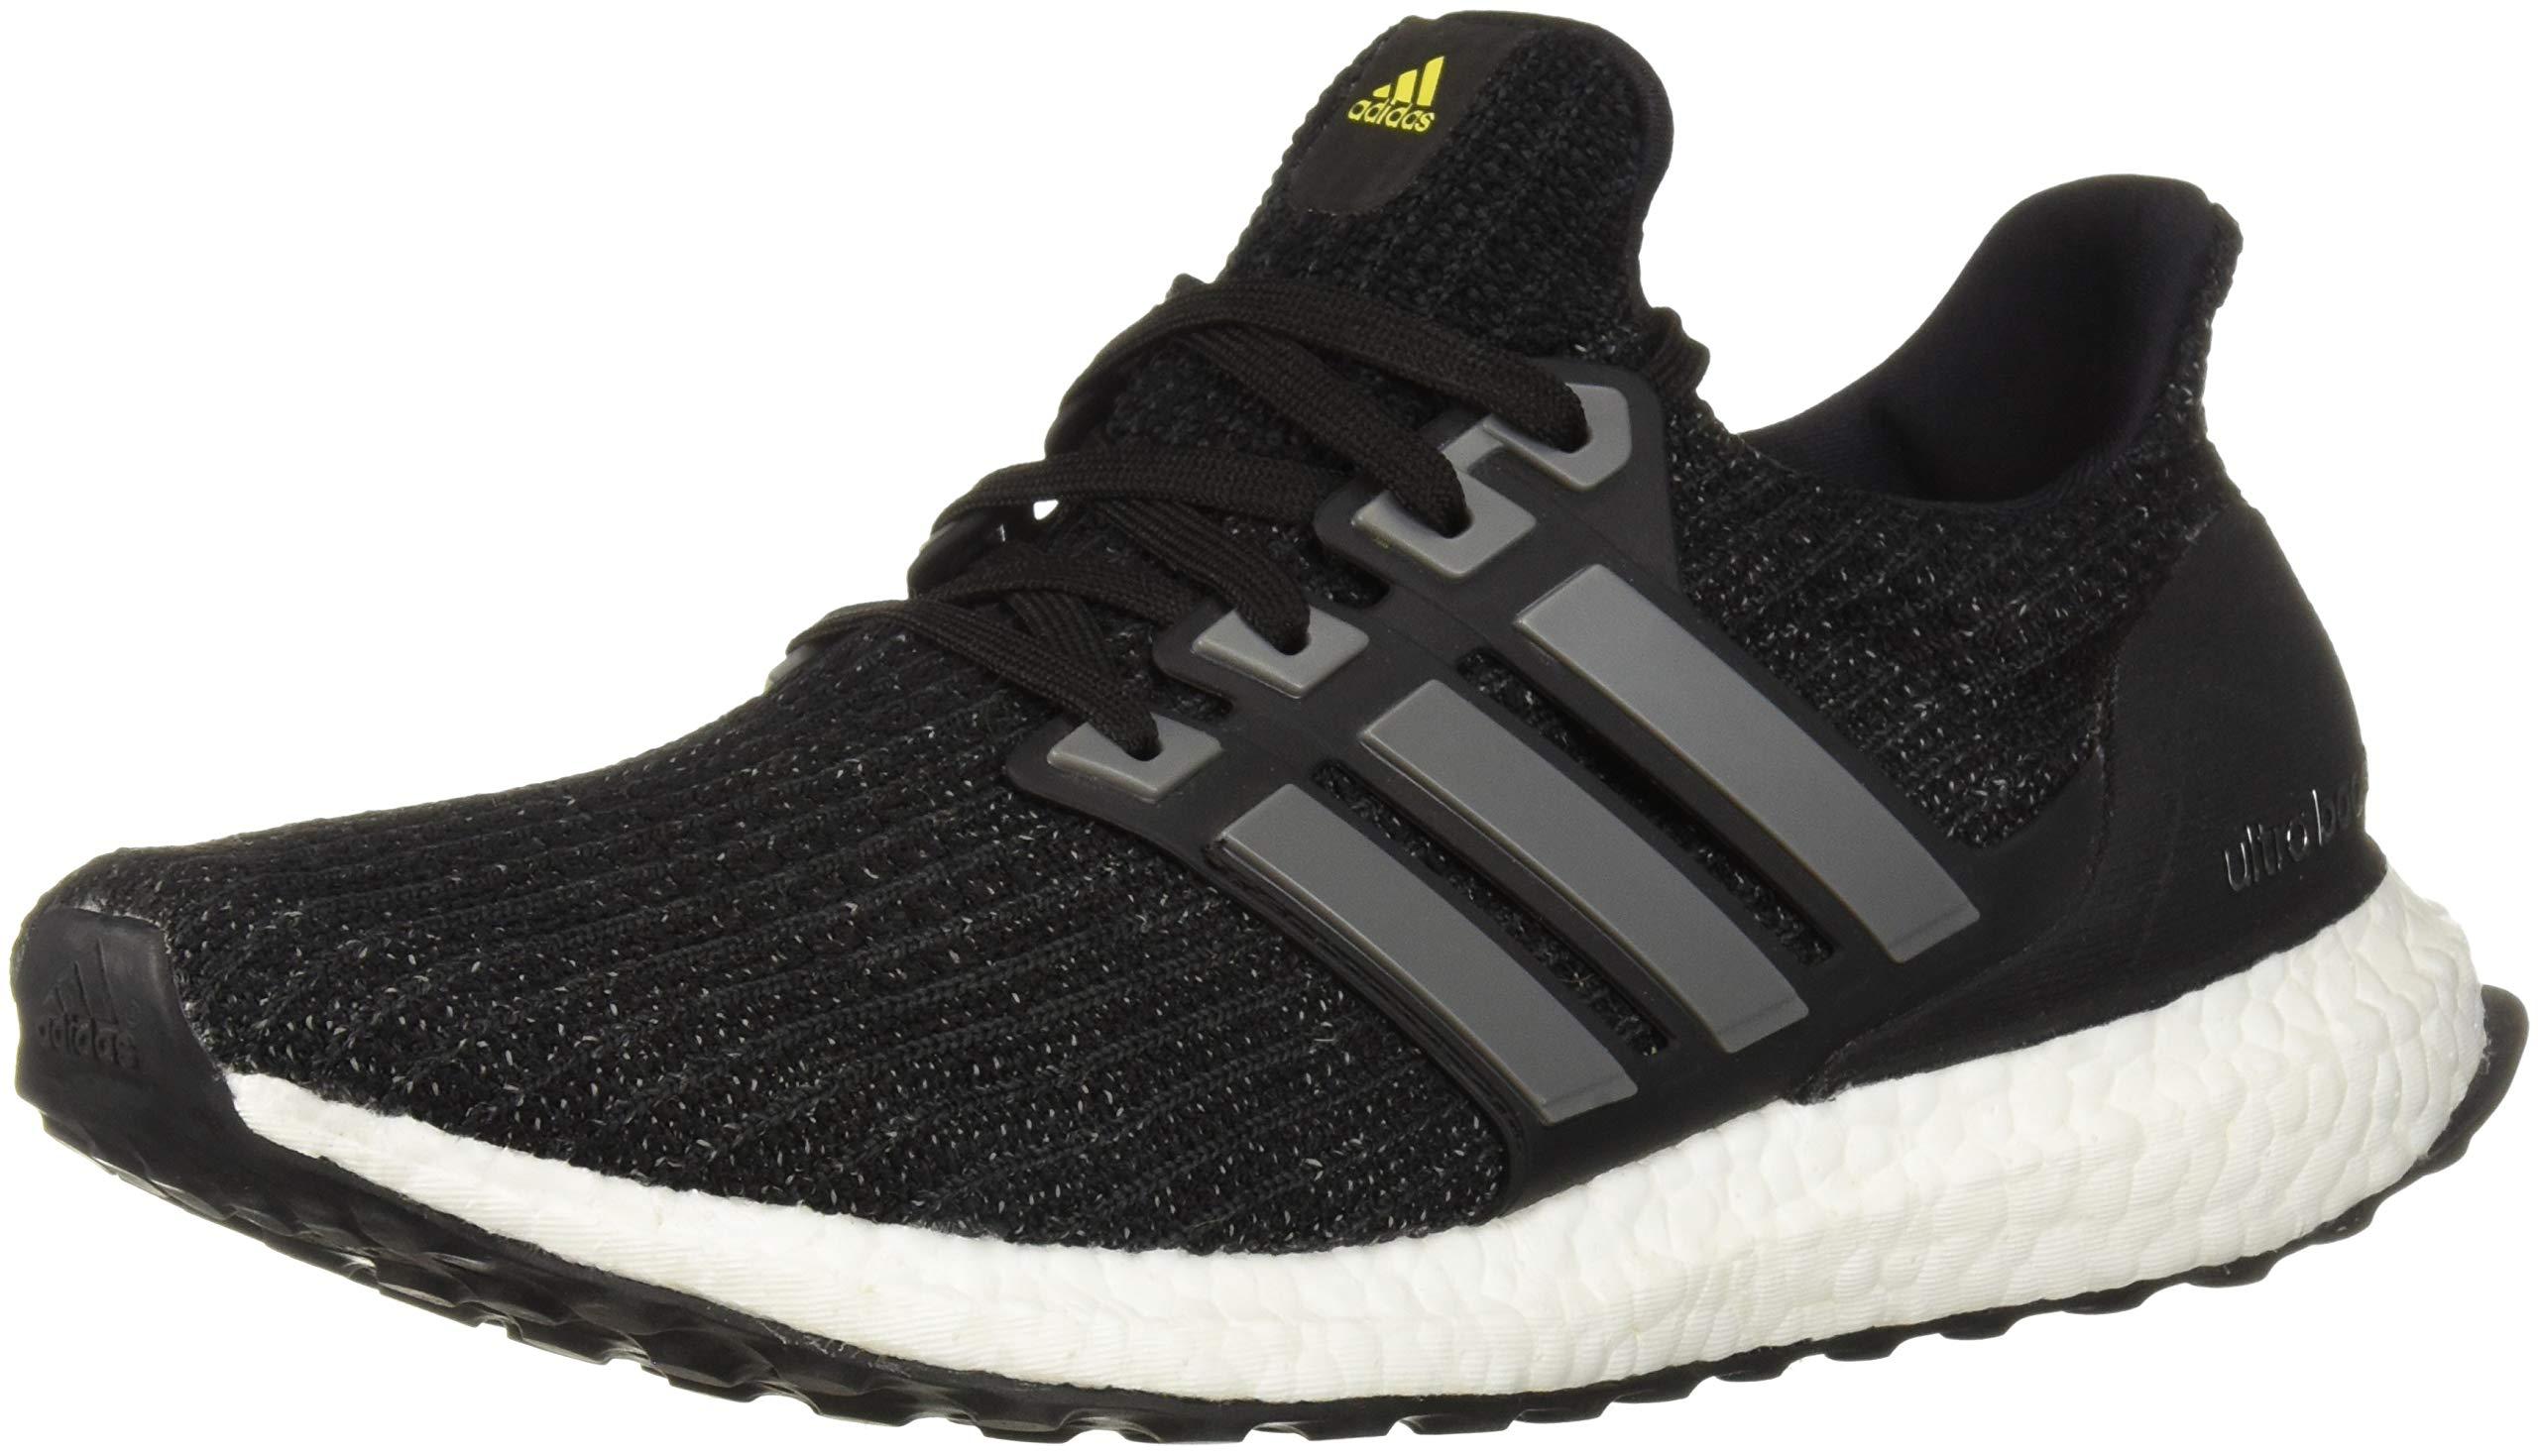 8ecffd3eed5 Adidas Ultra Boost 4.0 Black True Green EE3733 Men s Running Sneaker  MULTIPLE SZ.  169.99. adidas Men s Ultraboost LTD